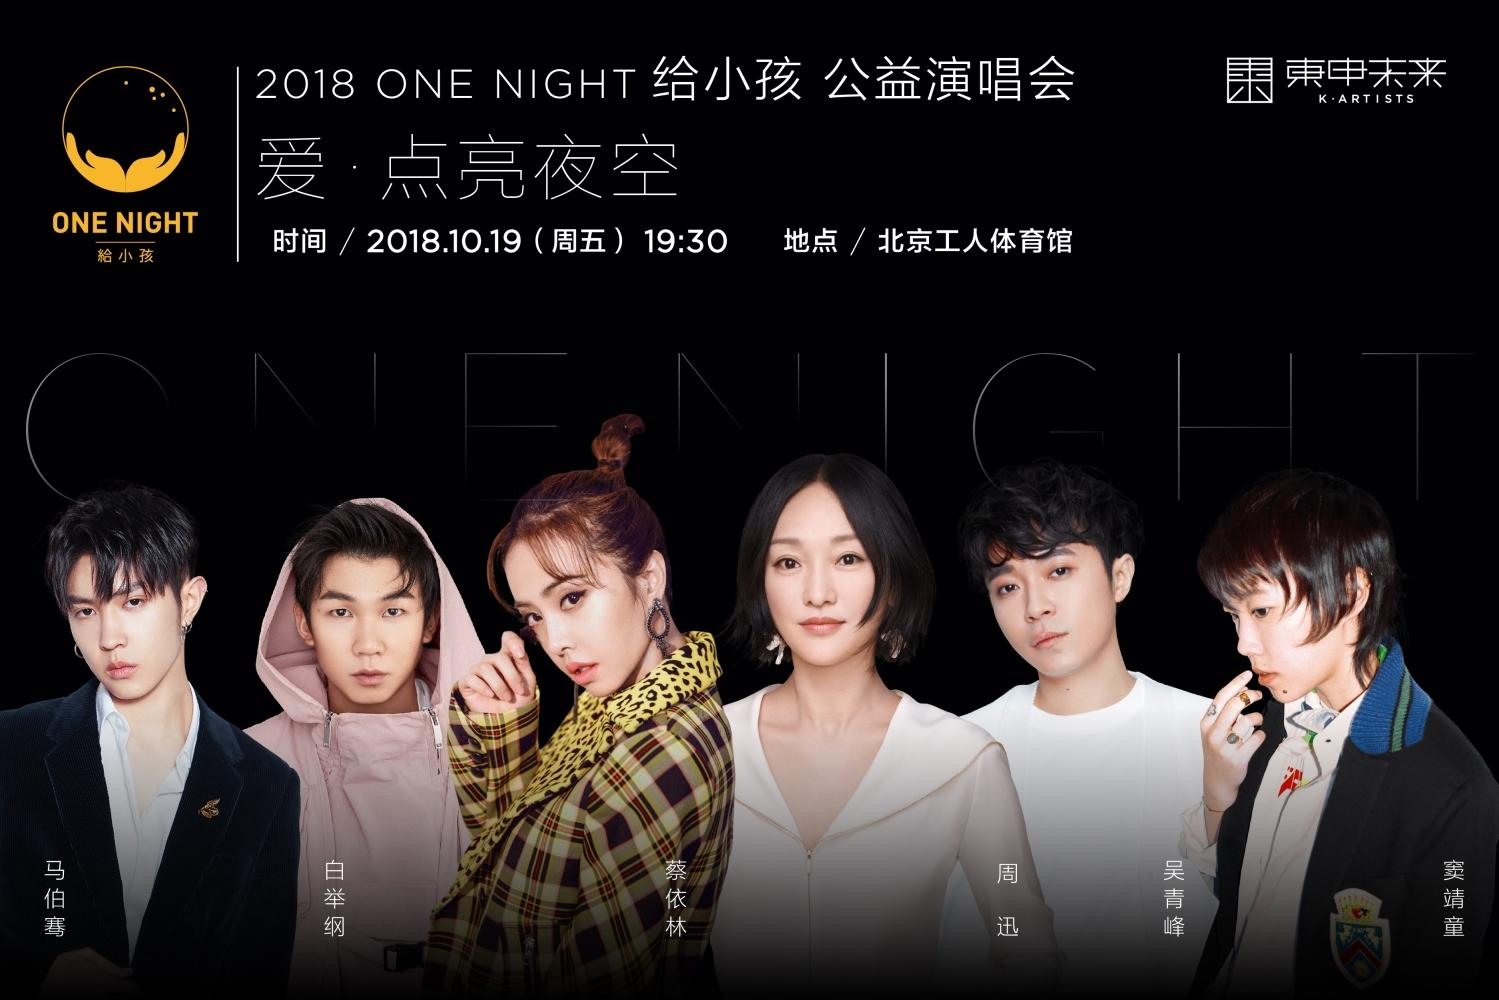 ONE NIGHT公益演唱会曝阵容 众星为爱开唱